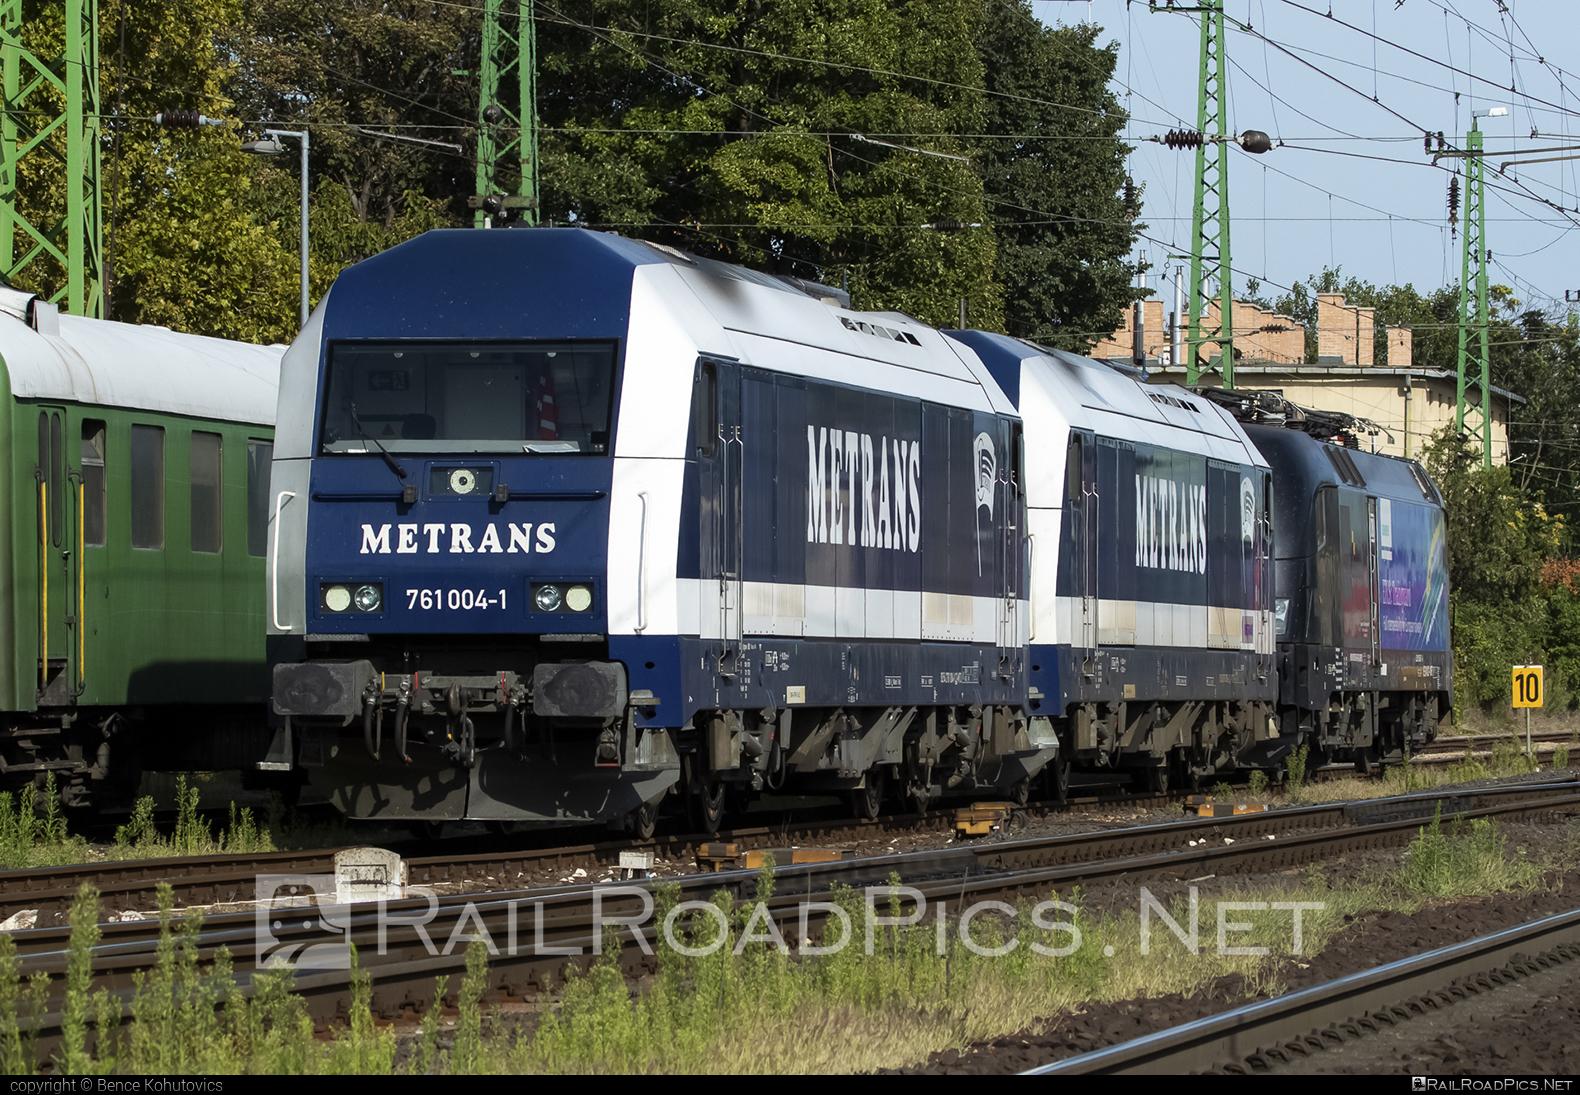 Siemens ER20 - 761 004-1 operated by METRANS (Danubia) a.s. #er20 #er20hercules #eurorunner #hercules #hhla #metrans #metransdanubia #siemens #siemenser20 #siemenser20hercules #siemenseurorunner #siemenshercules